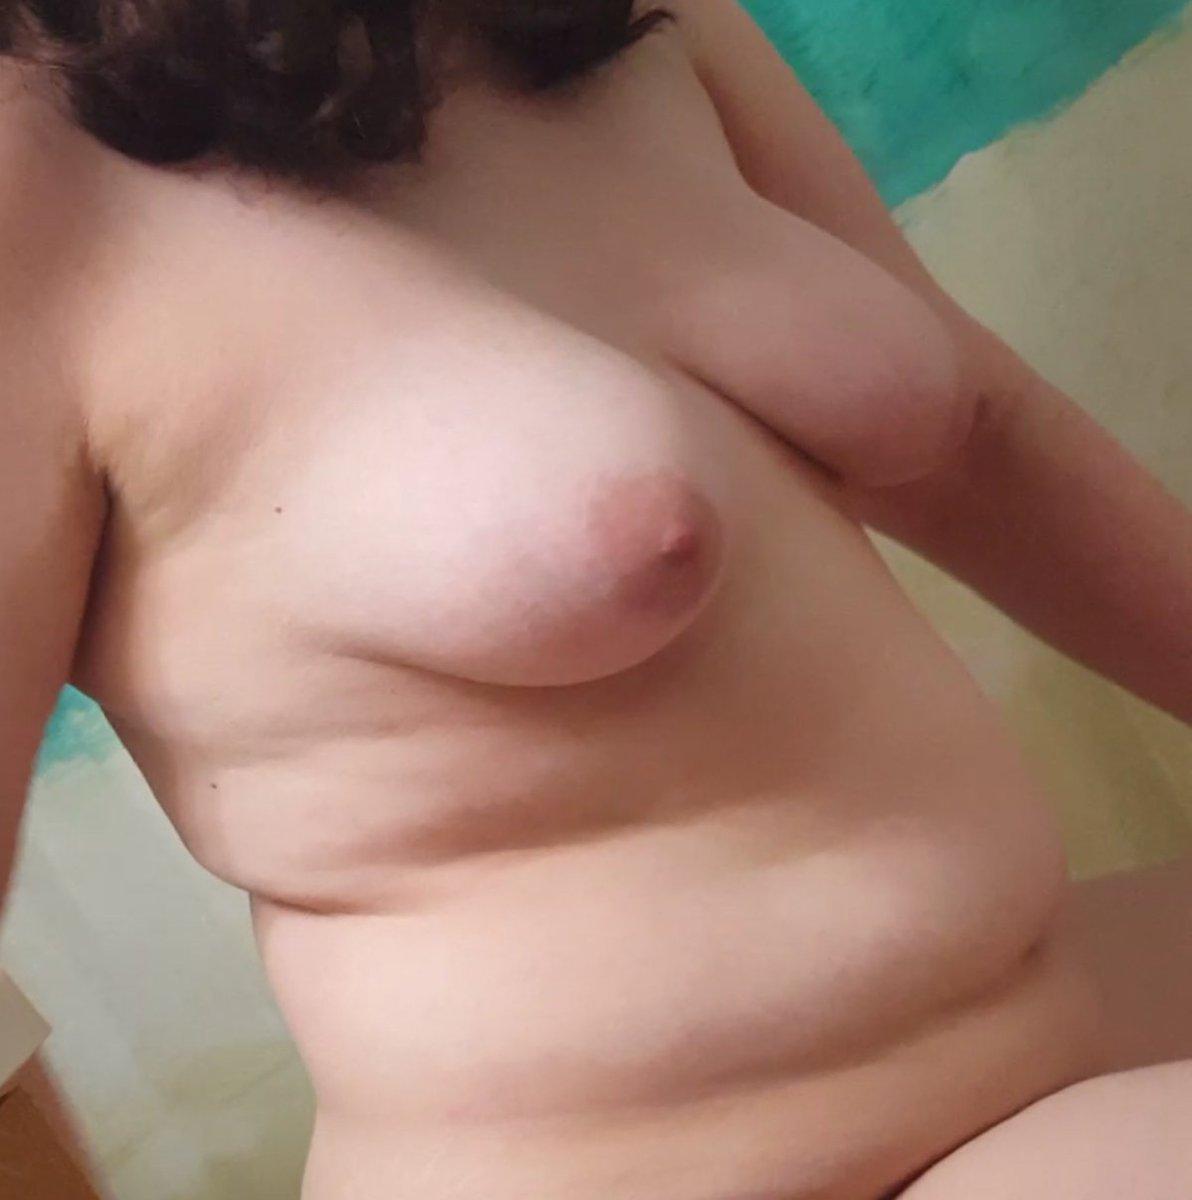 Nude Selfie 4793